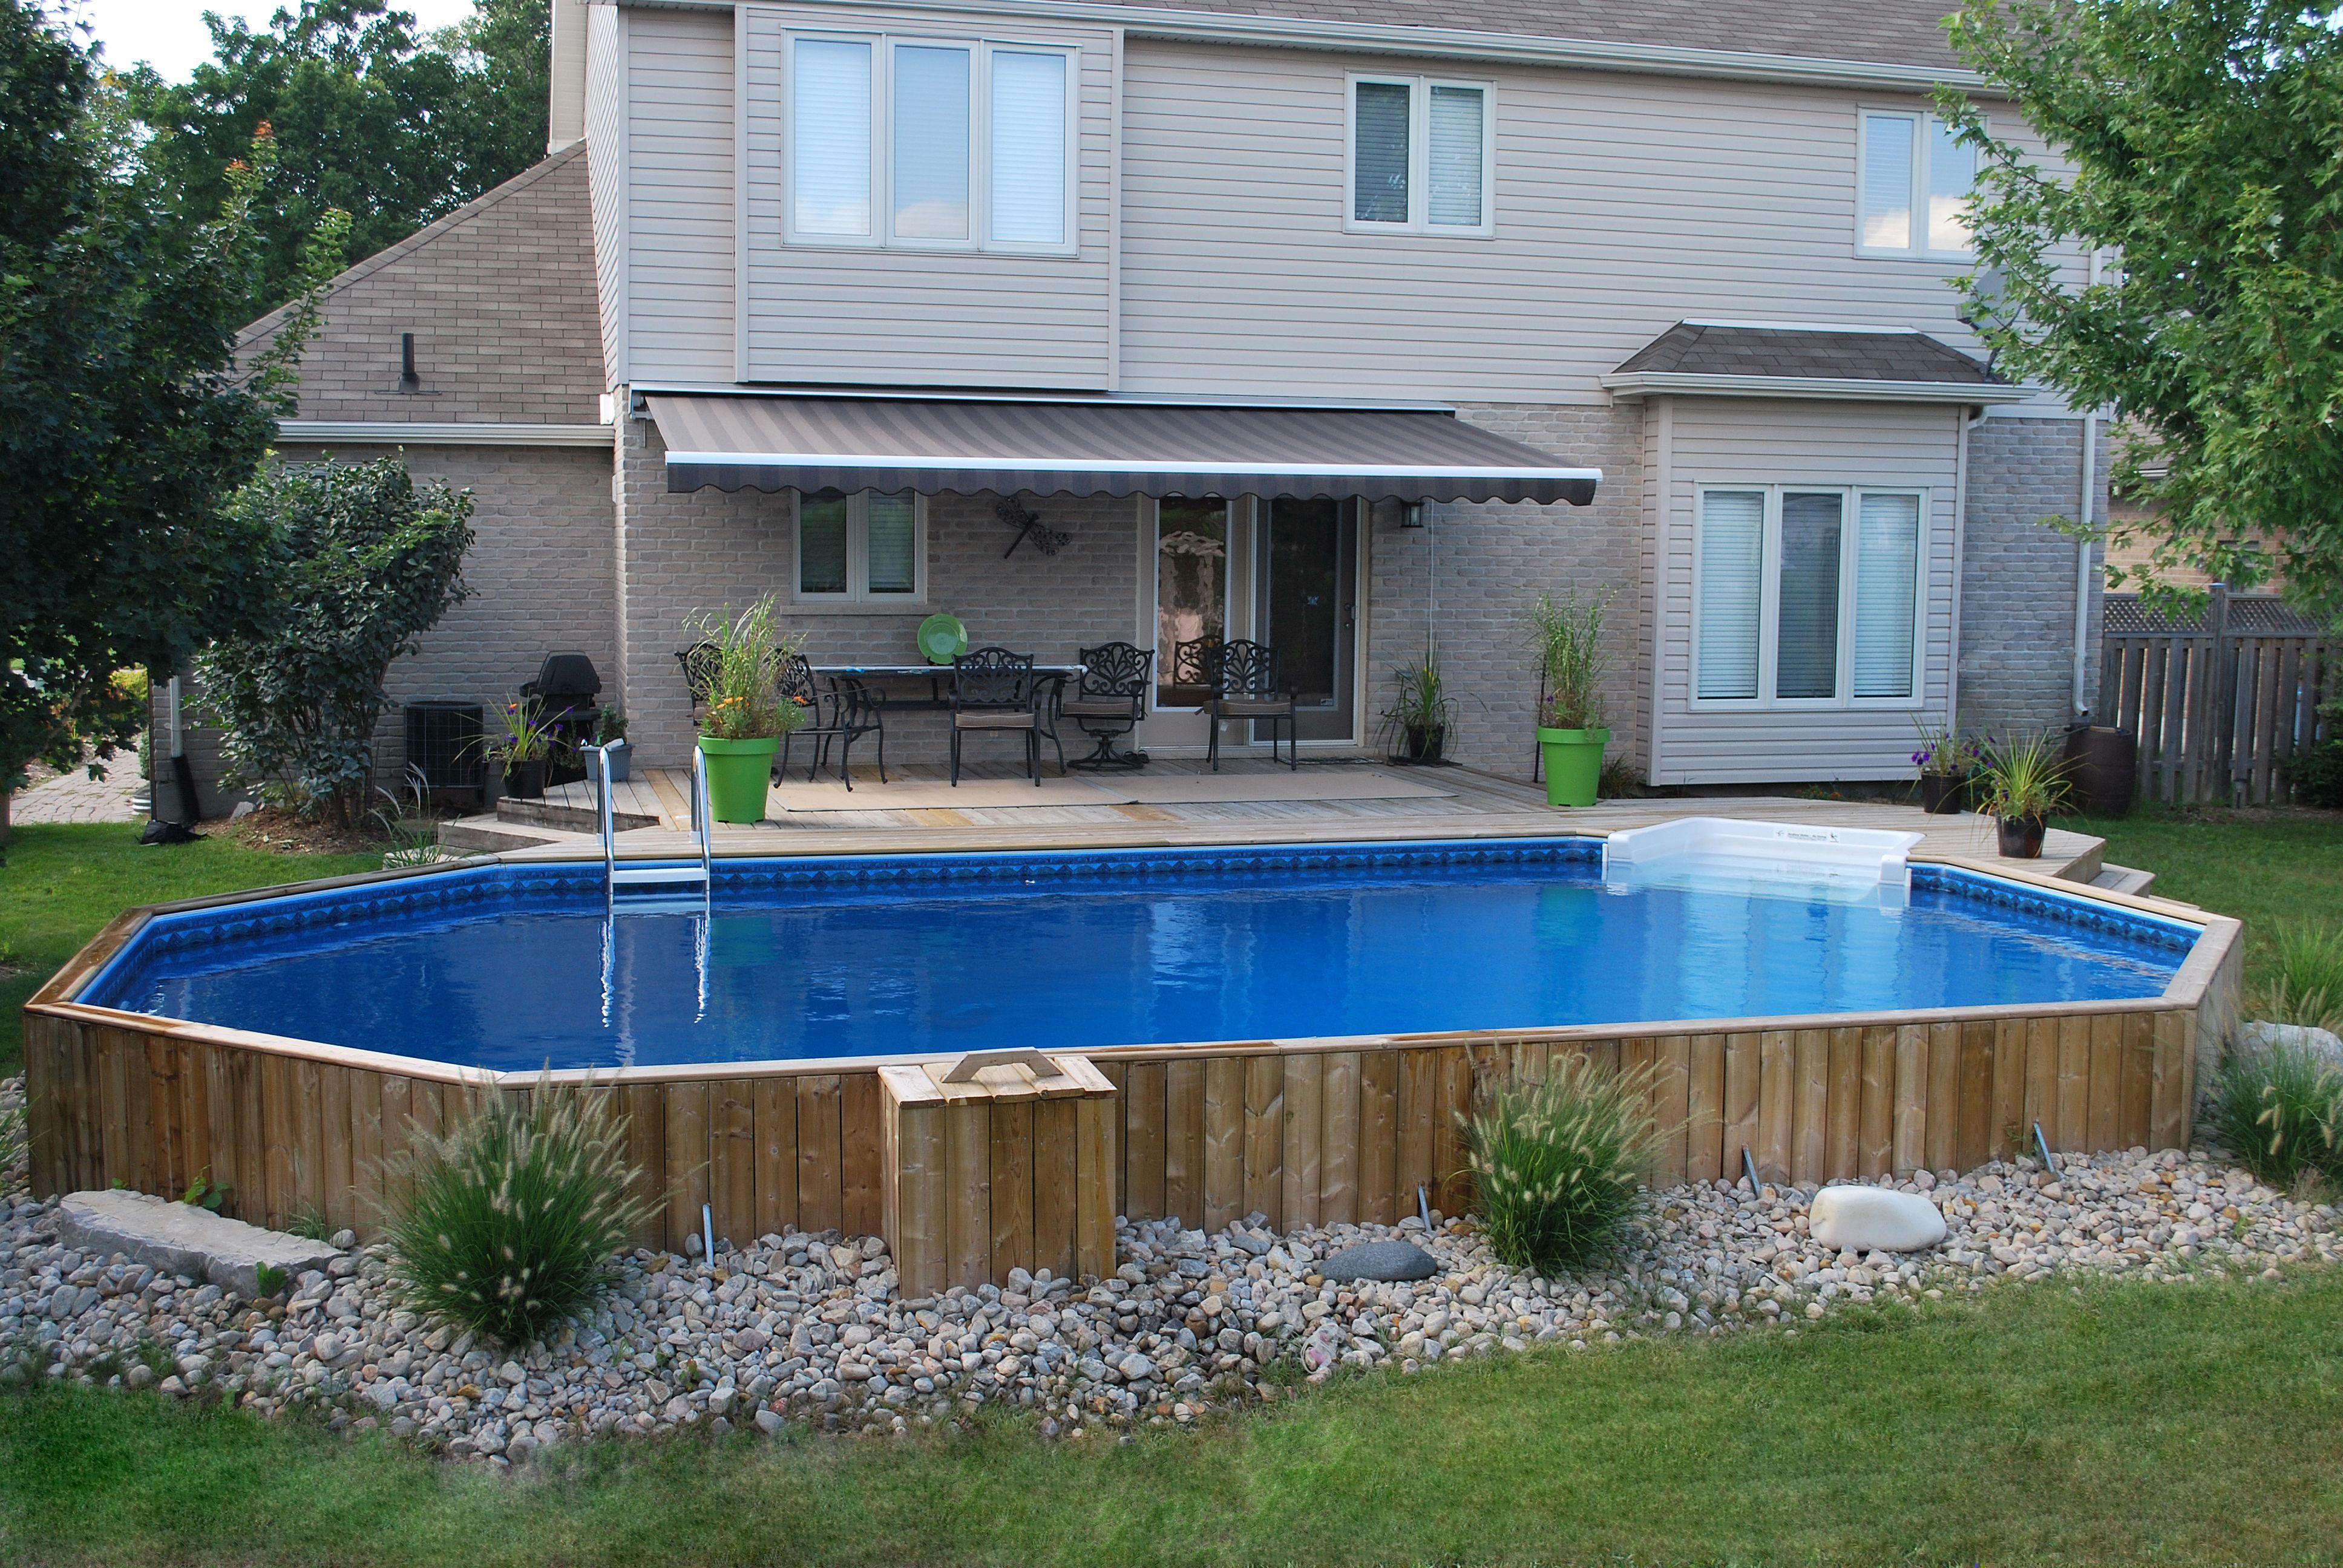 28 Pool Ideas Pool In Ground Pools Backyard Pool